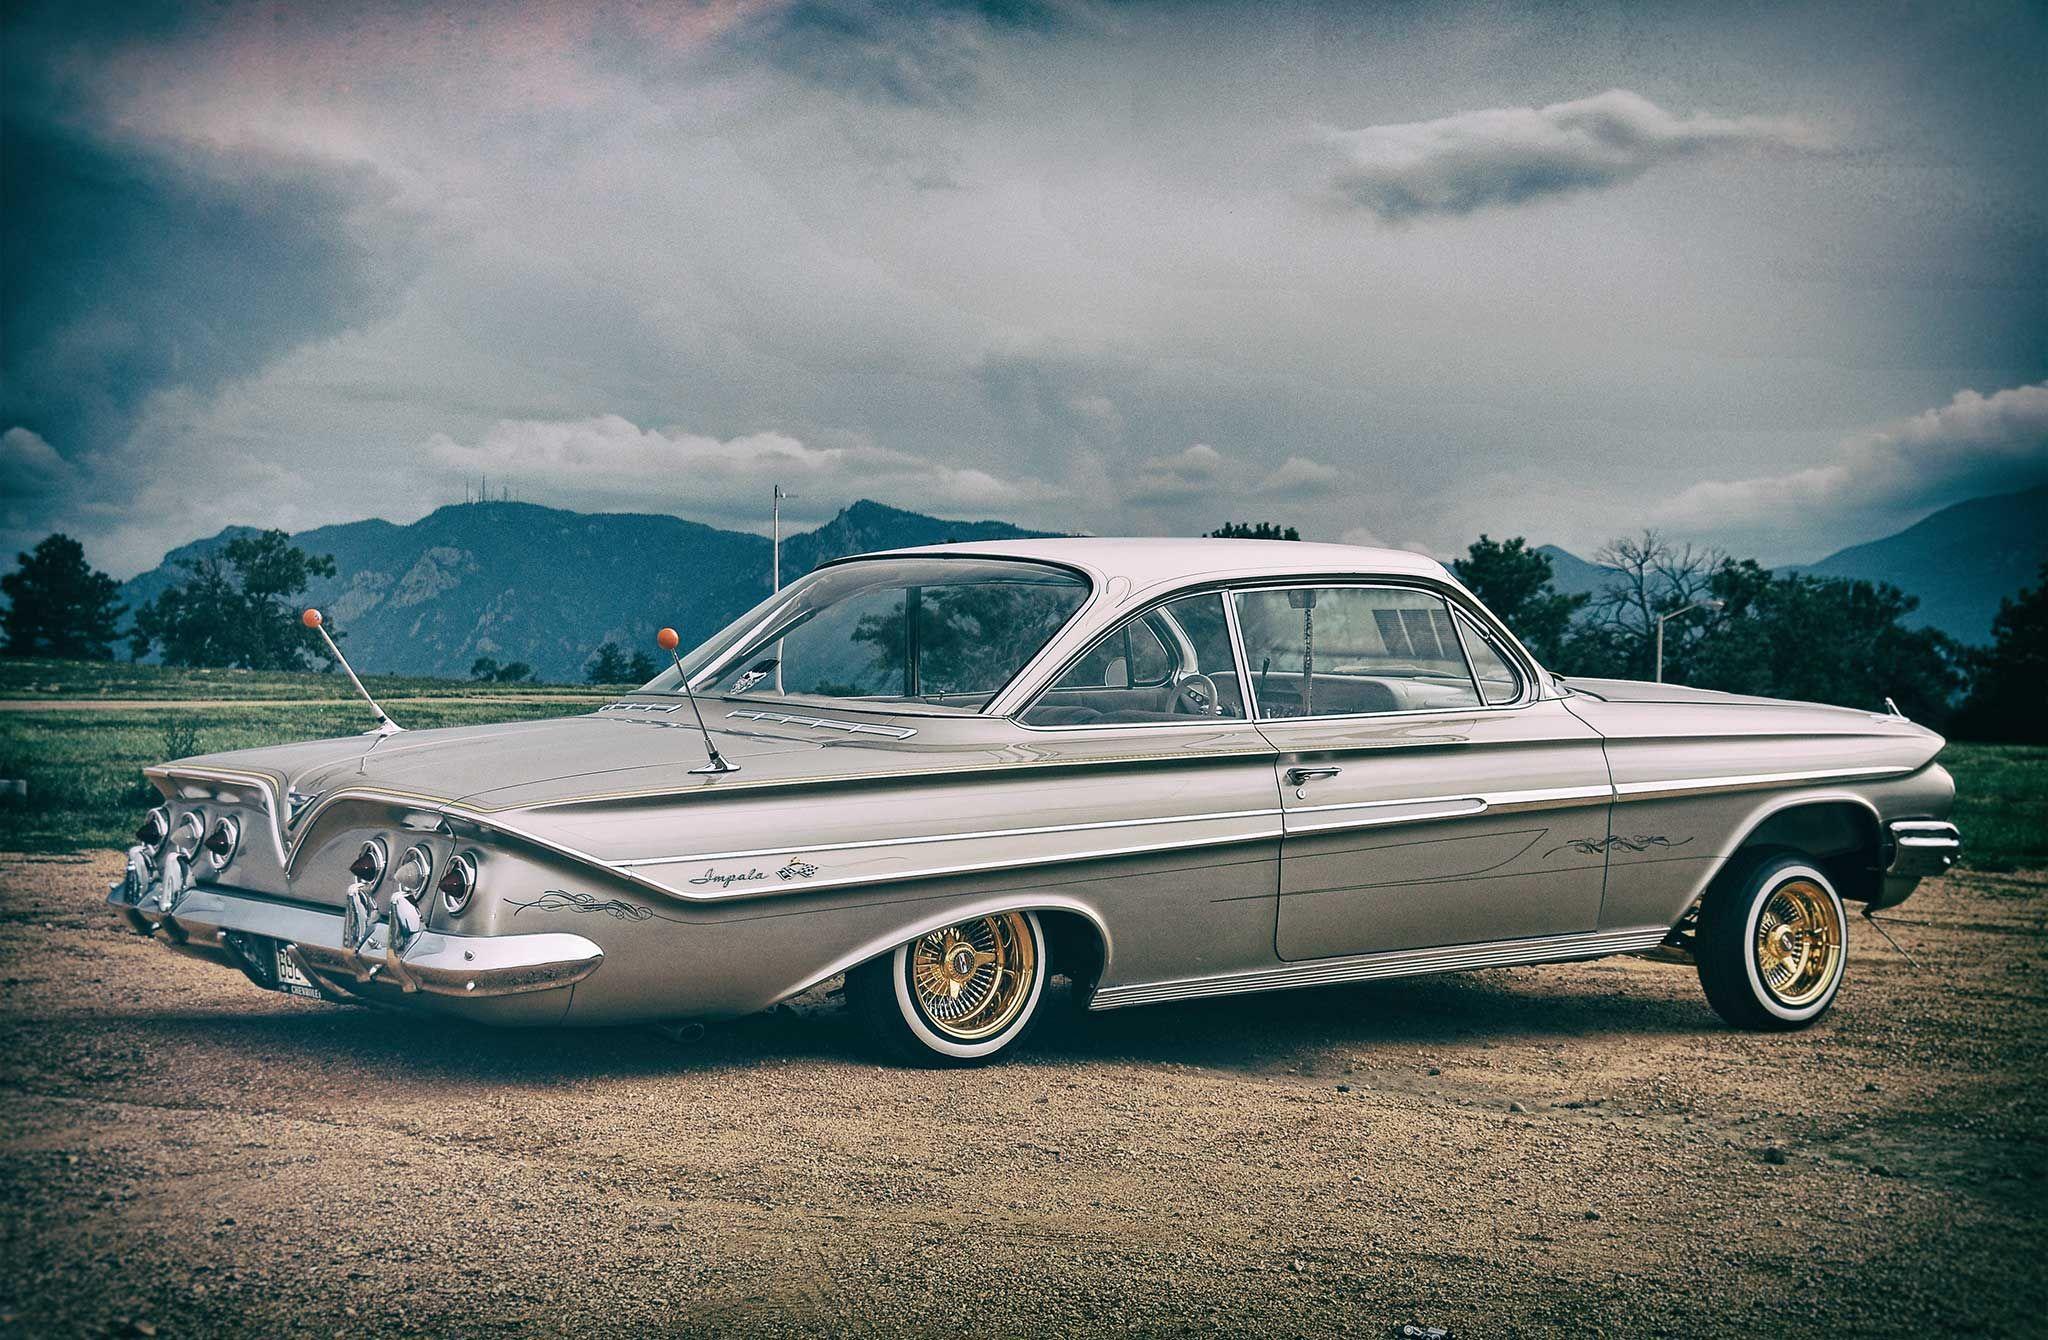 1961 chevrolet impala precious metals found a 61 impala pot of gold in colorado [ 2048 x 1340 Pixel ]